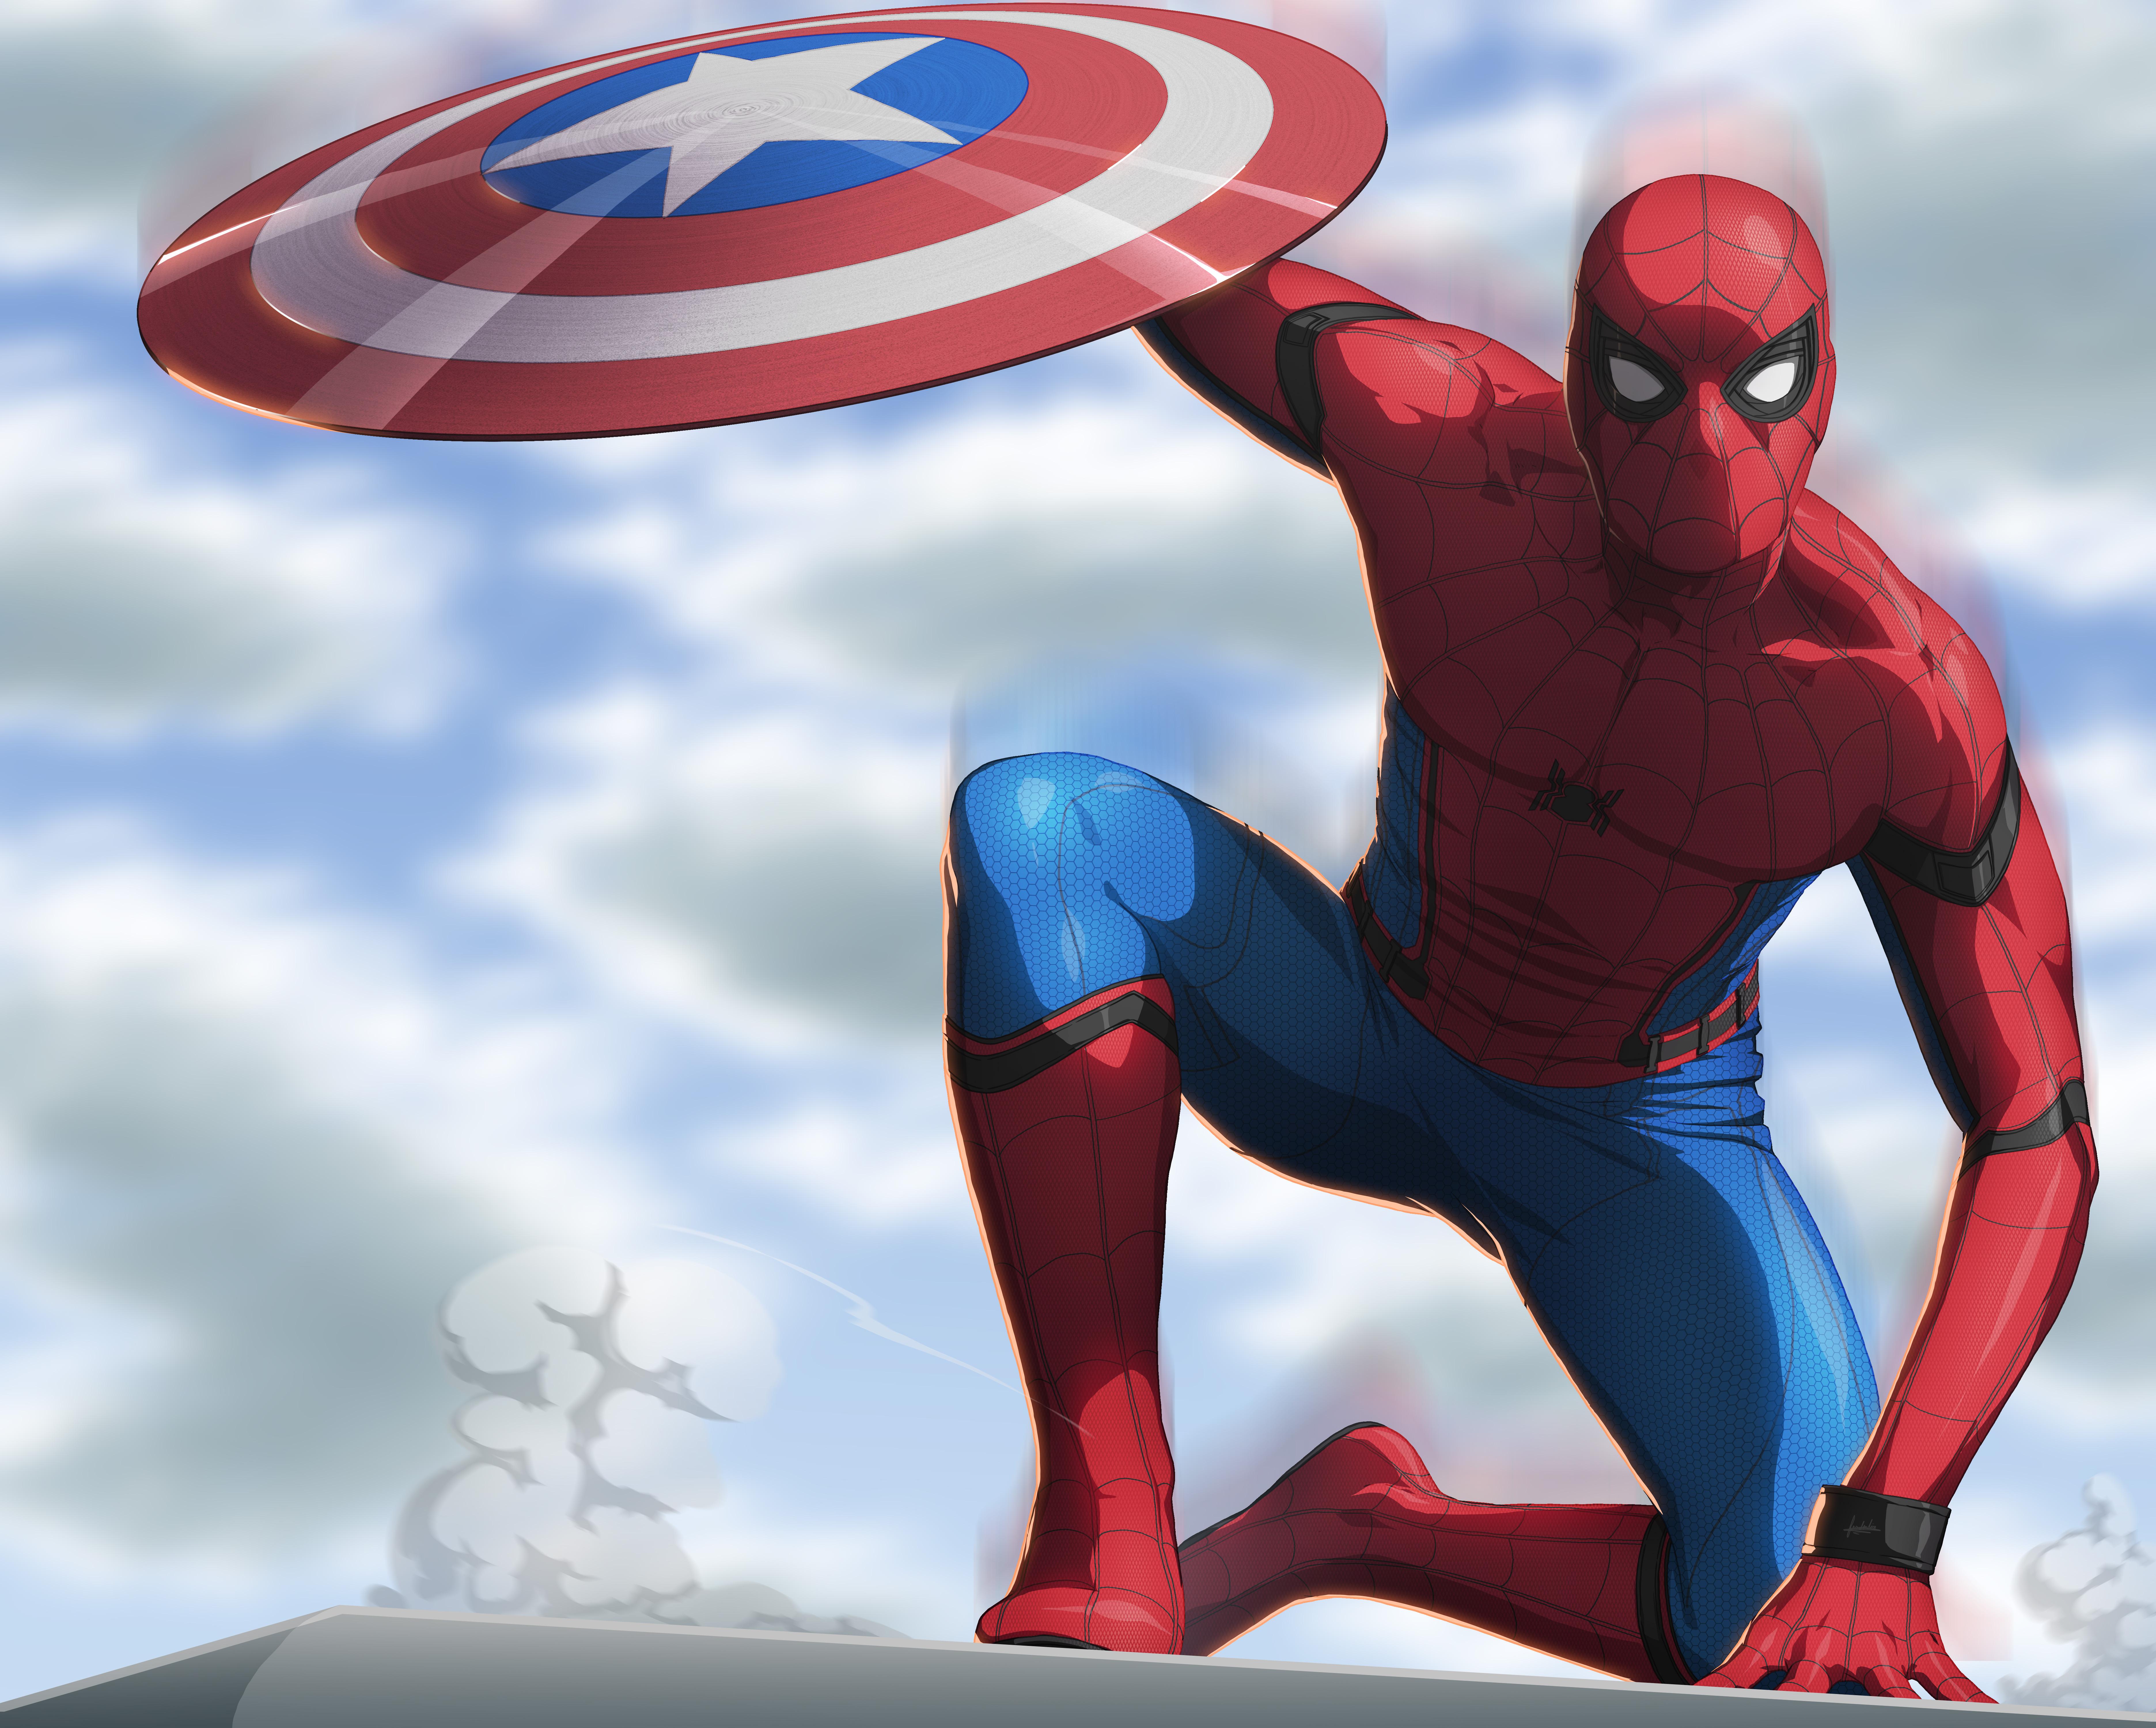 Spiderman Civil War Artwork 8k, HD Superheroes, 4k Wallpapers, Images, Backgrounds, Photos and